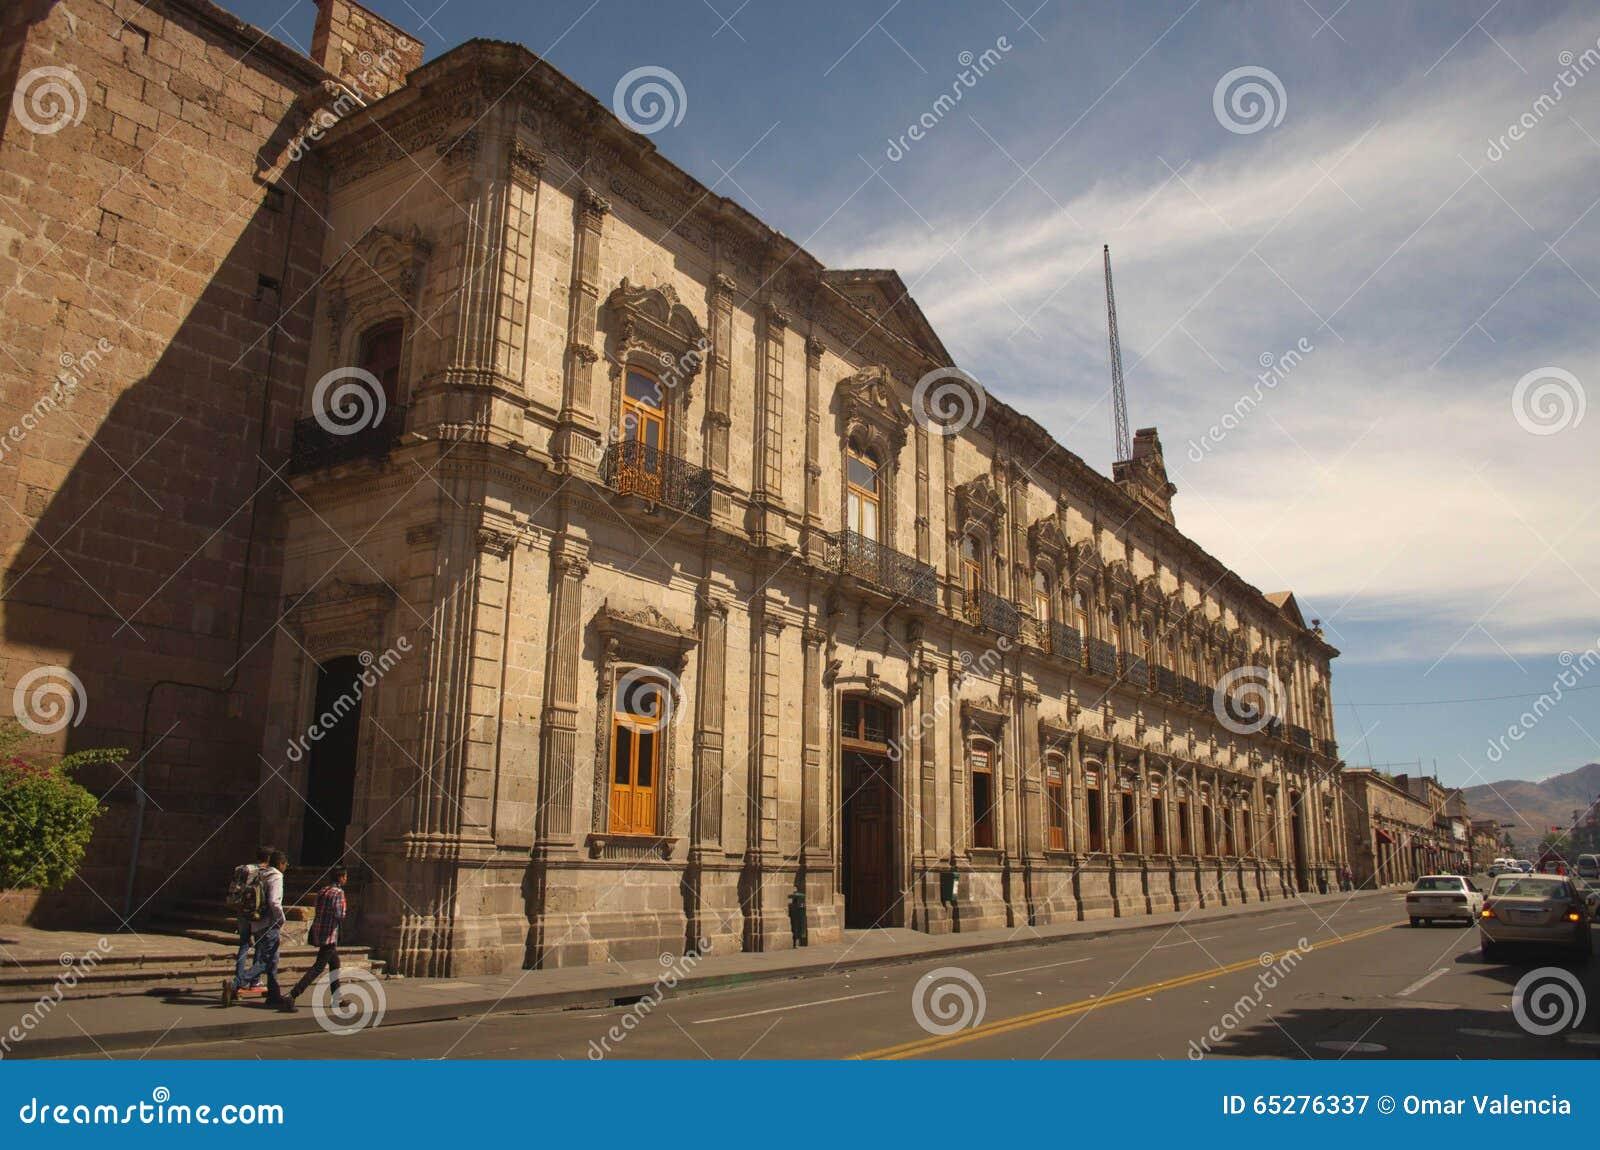 Ancient federal palace of Morelia